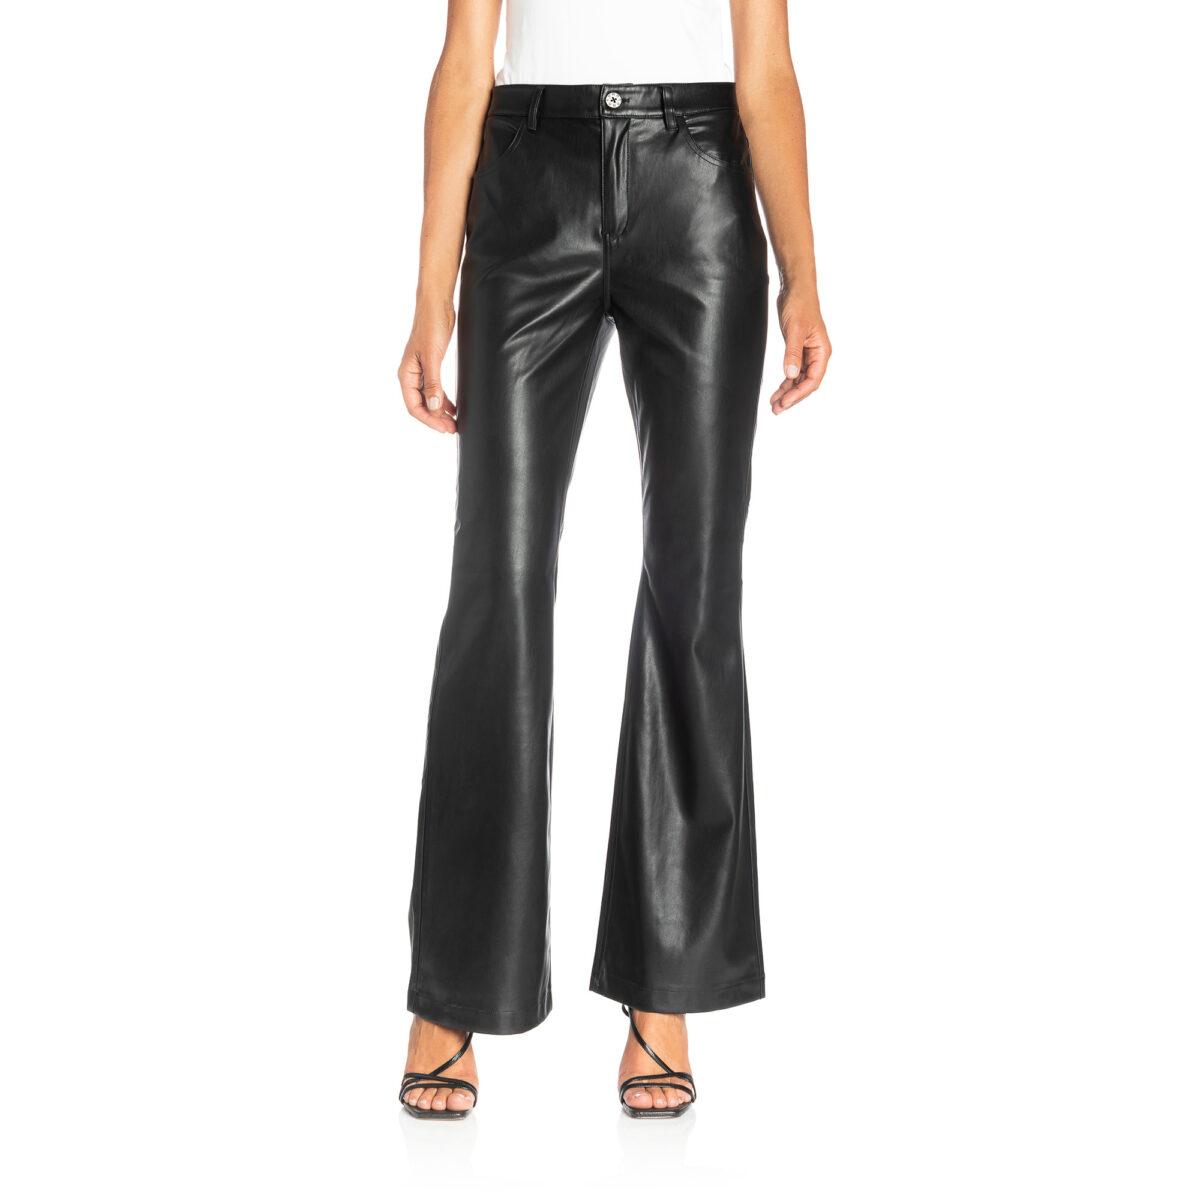 Pants Bootcut effetto pelle Nero - Nicla